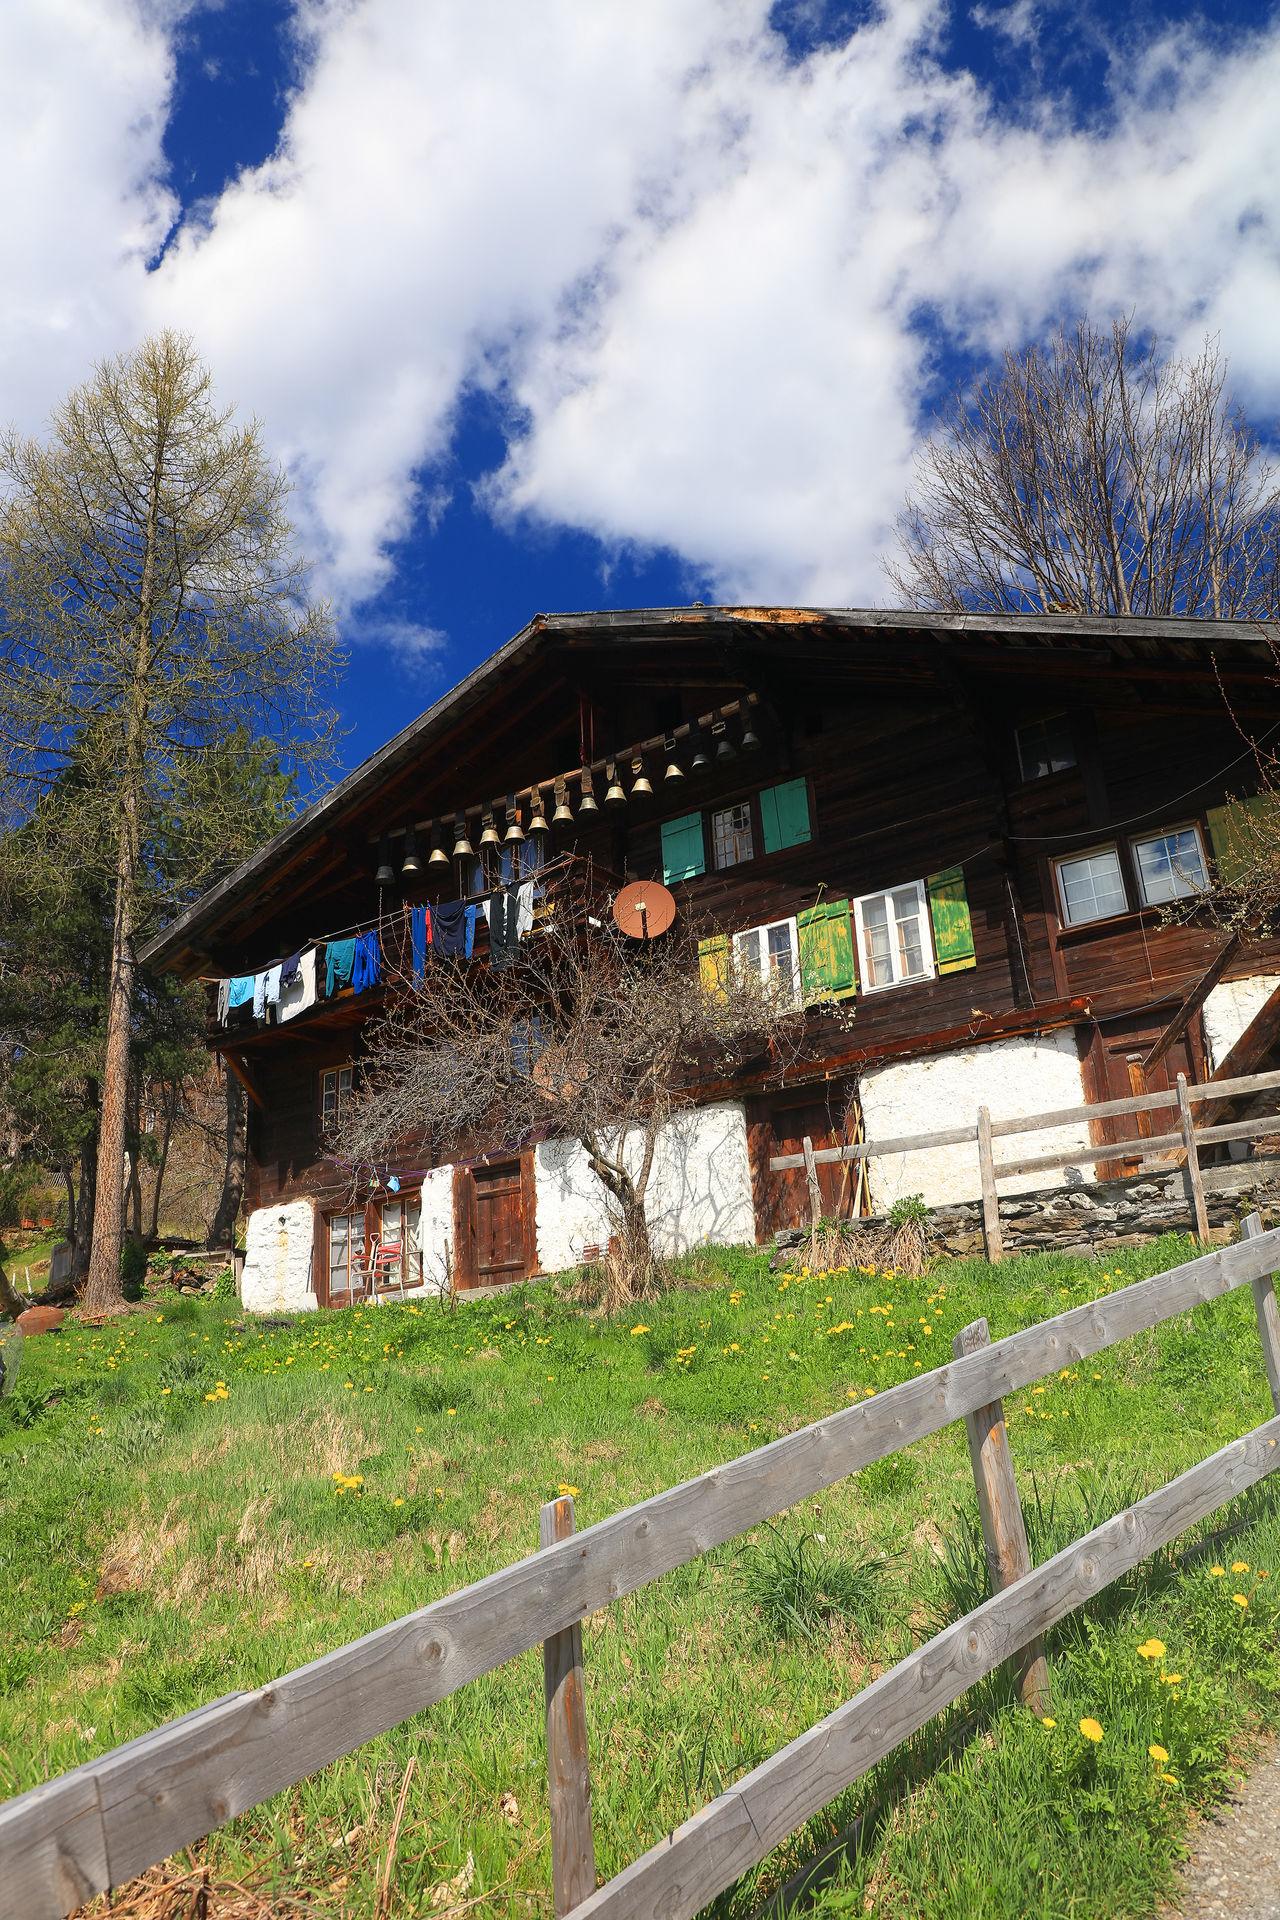 Canon Alpine Alpine Hiking Day Landscape_Collection Landscape_photography Lauterbrunnen Lauterbrunnen Valley Outdoors Travel Destinations Travel Photography Wengen Wengen Switzerland